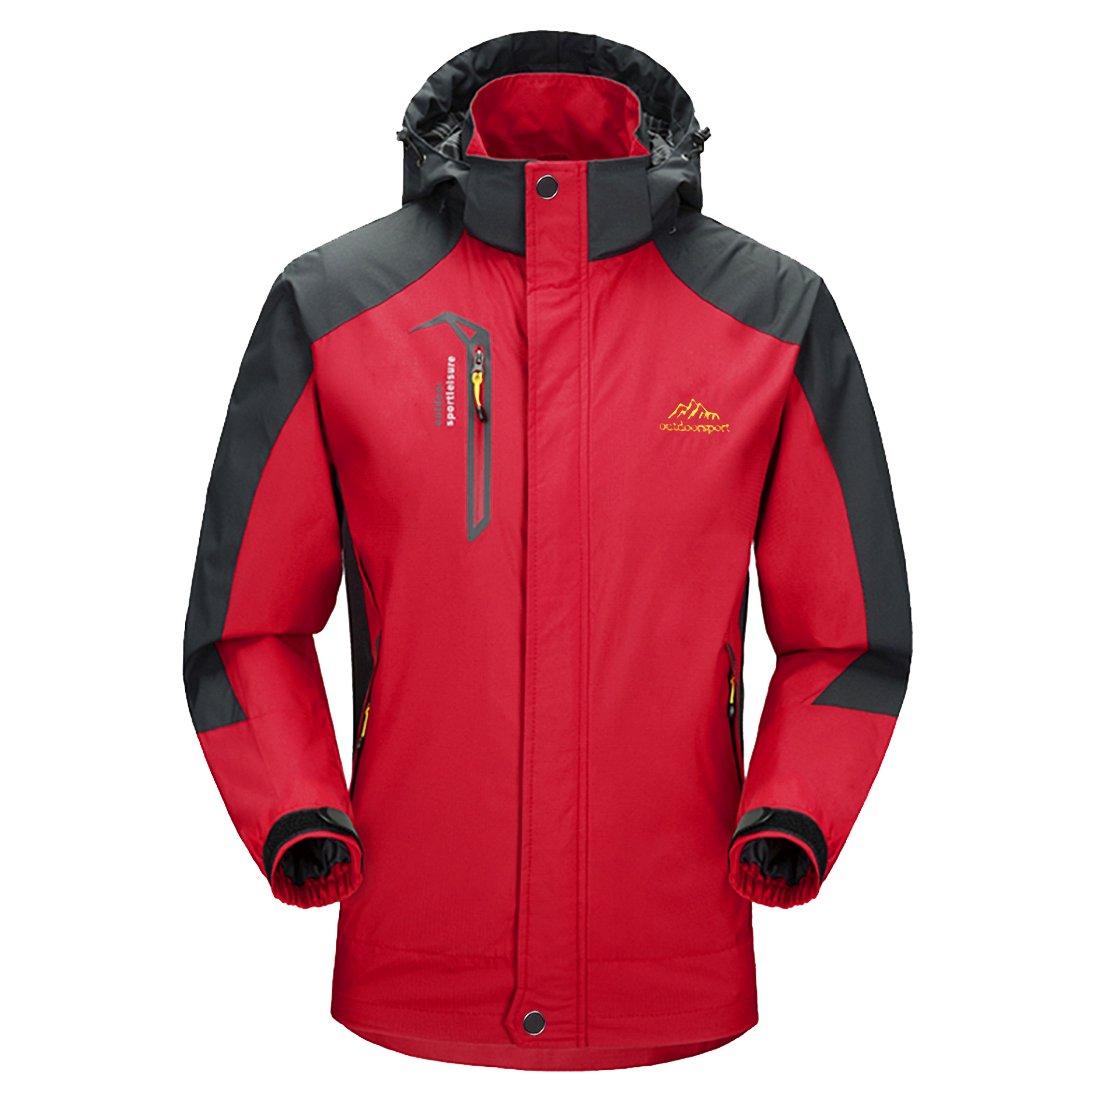 MICKYMIN Waterproof Jacket Mens Raincoats Outdoor Casual Hooded Lightweight Softshell Hiking Windproof Travel Rain Jackets